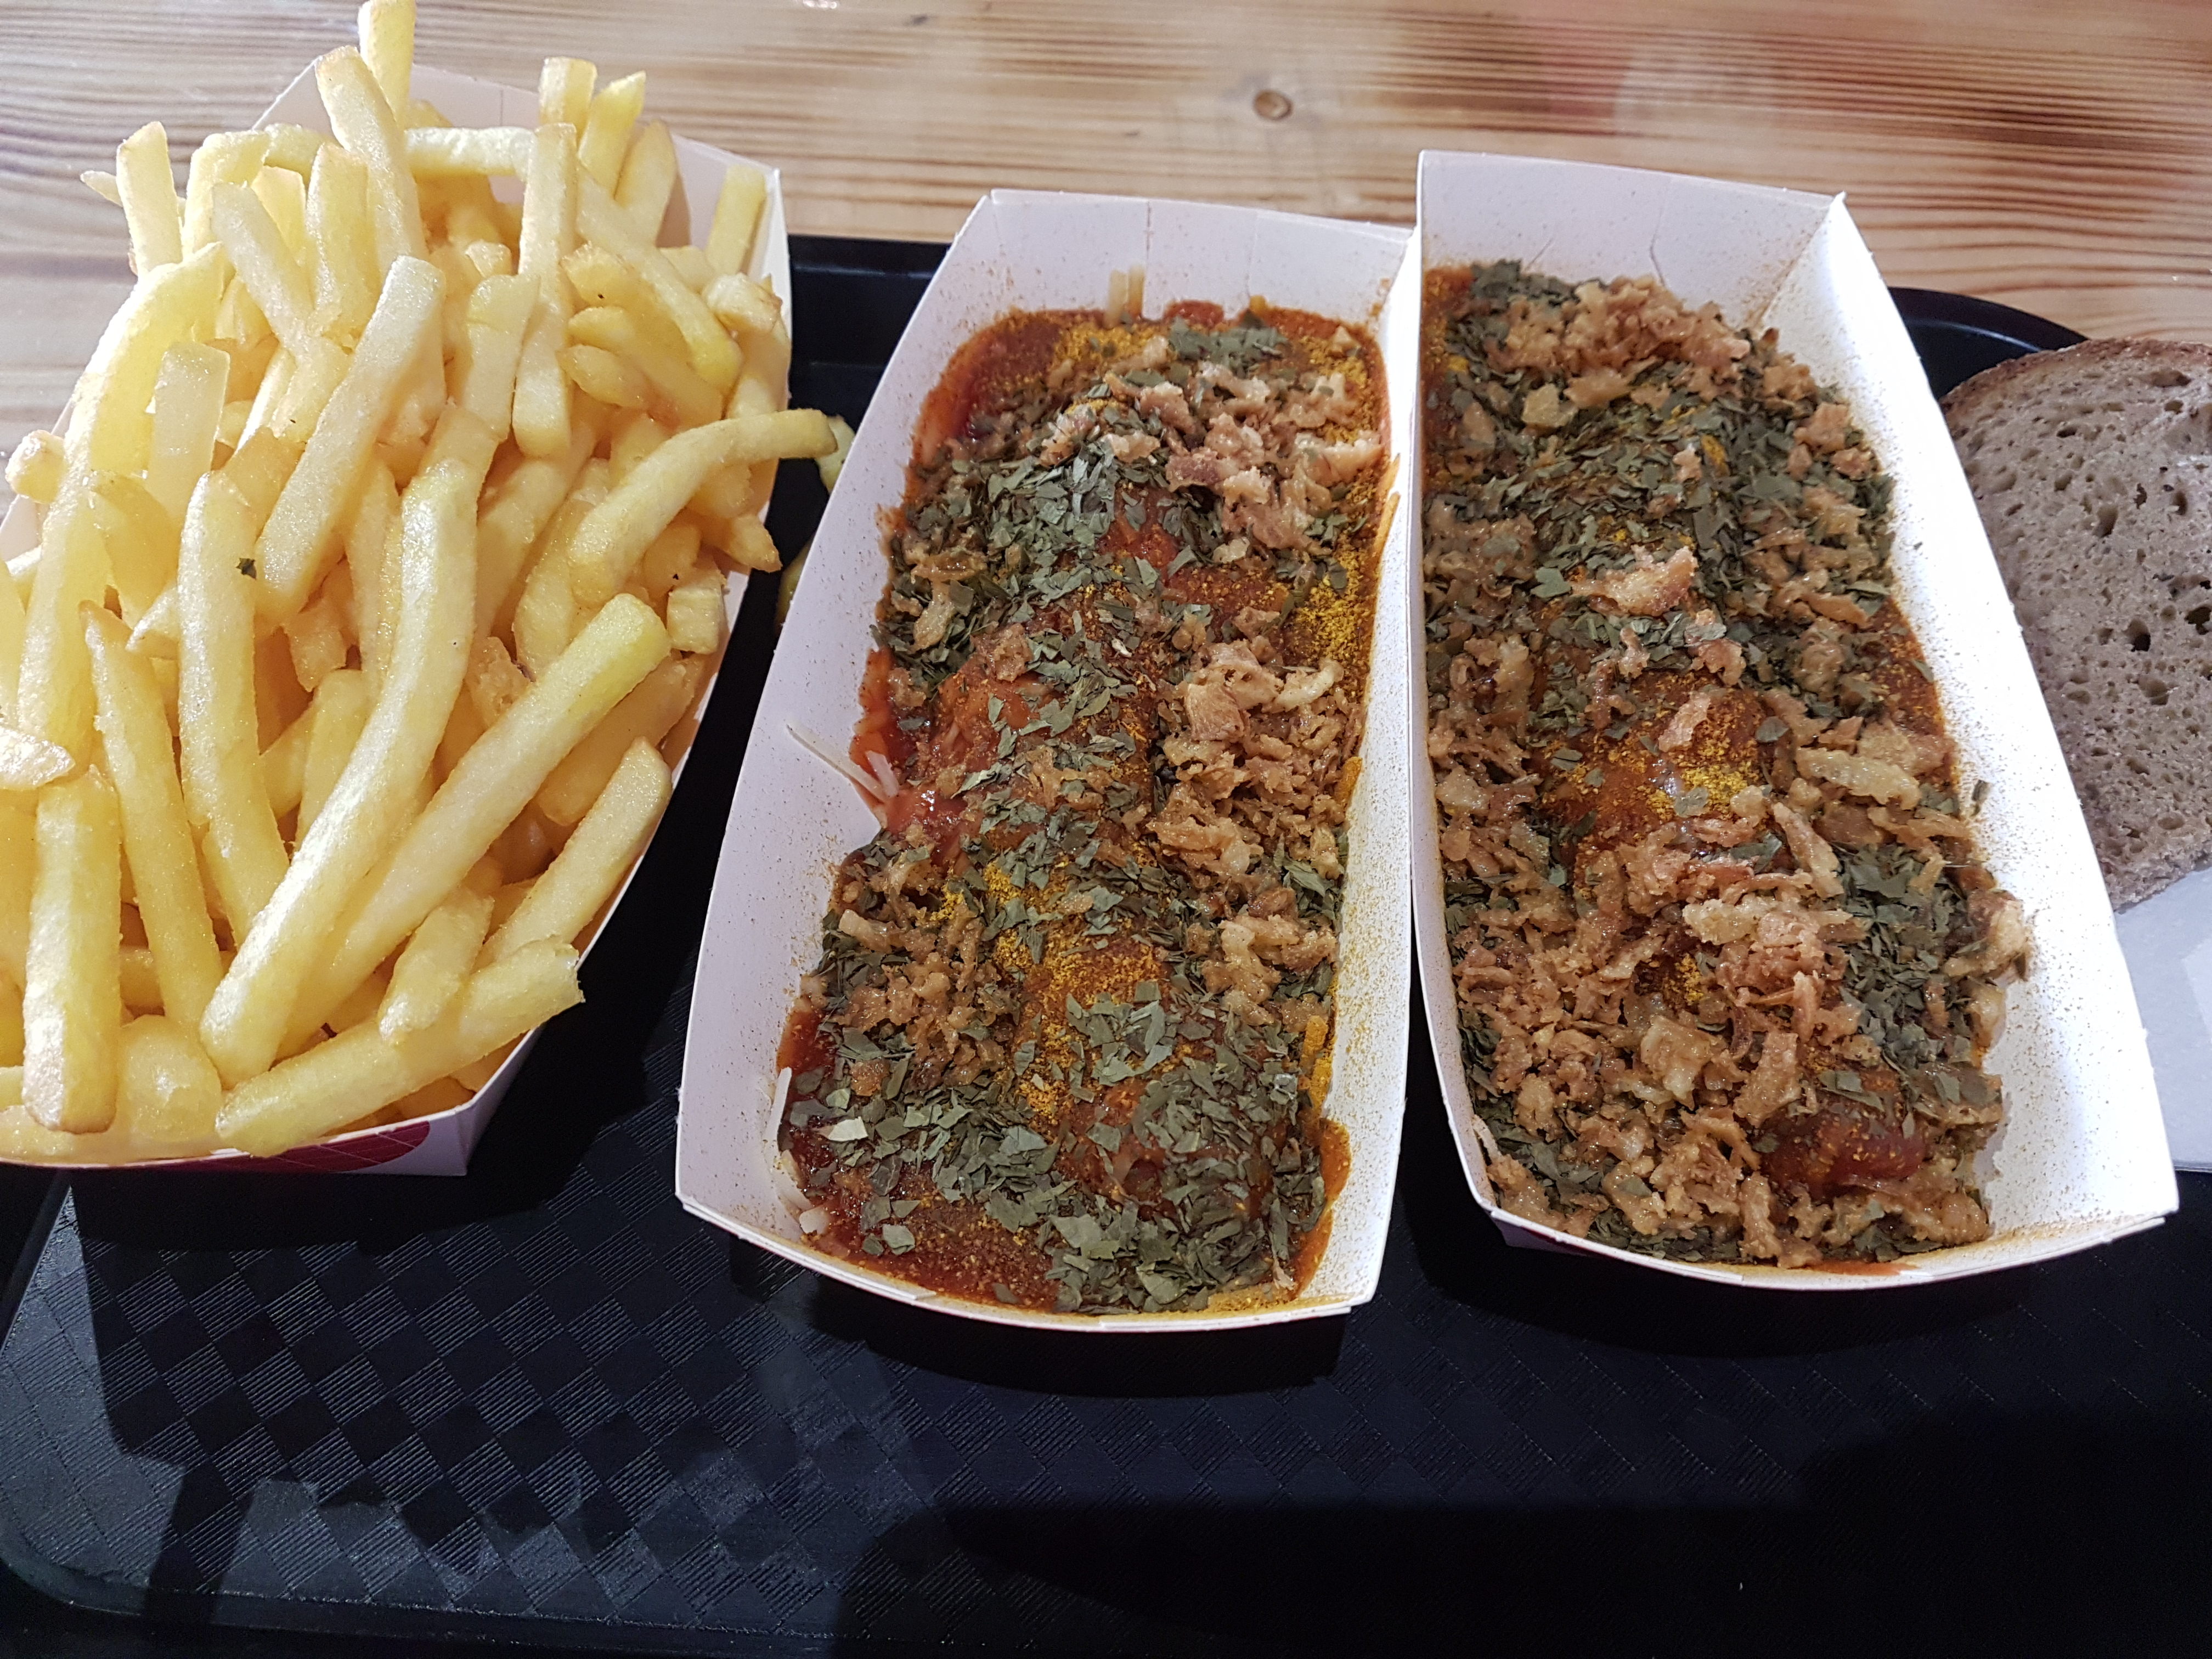 http://foodloader.net/Holz_2018-05-28_DJ_Duese_Wurst.jpg